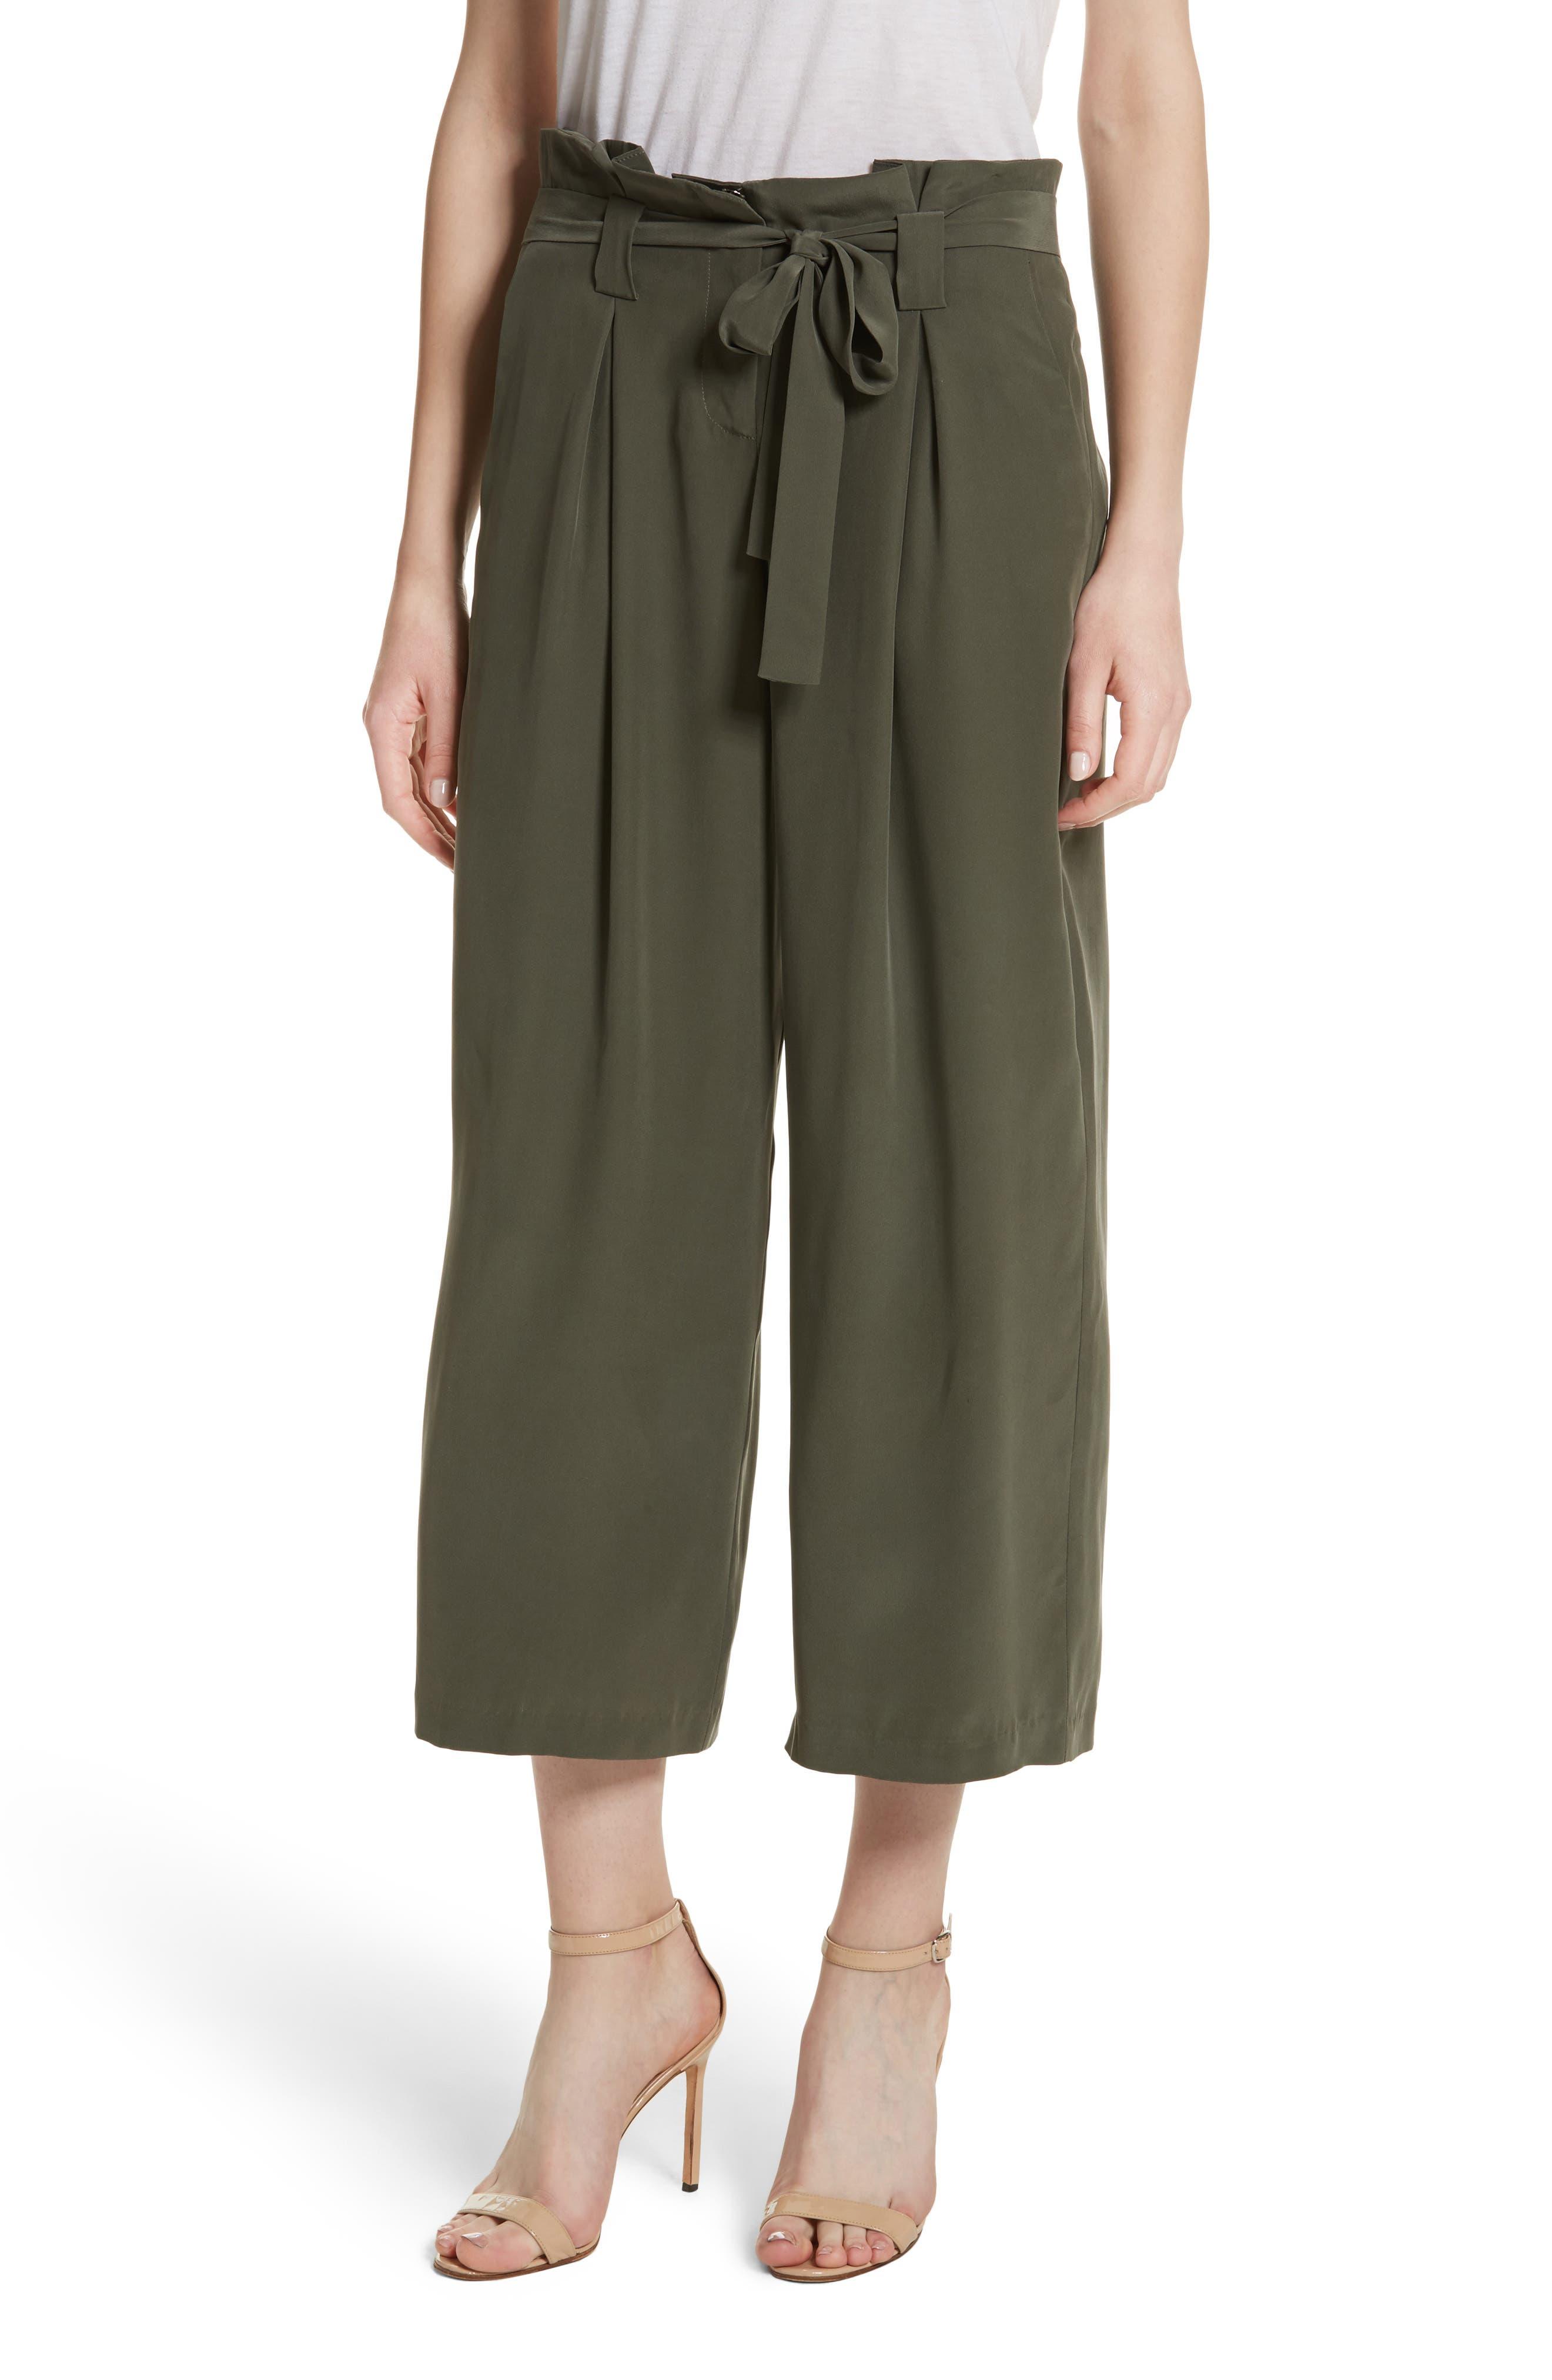 Alternate Image 1 Selected - L'AGENCE Samira Paperbag Wide Leg Pants